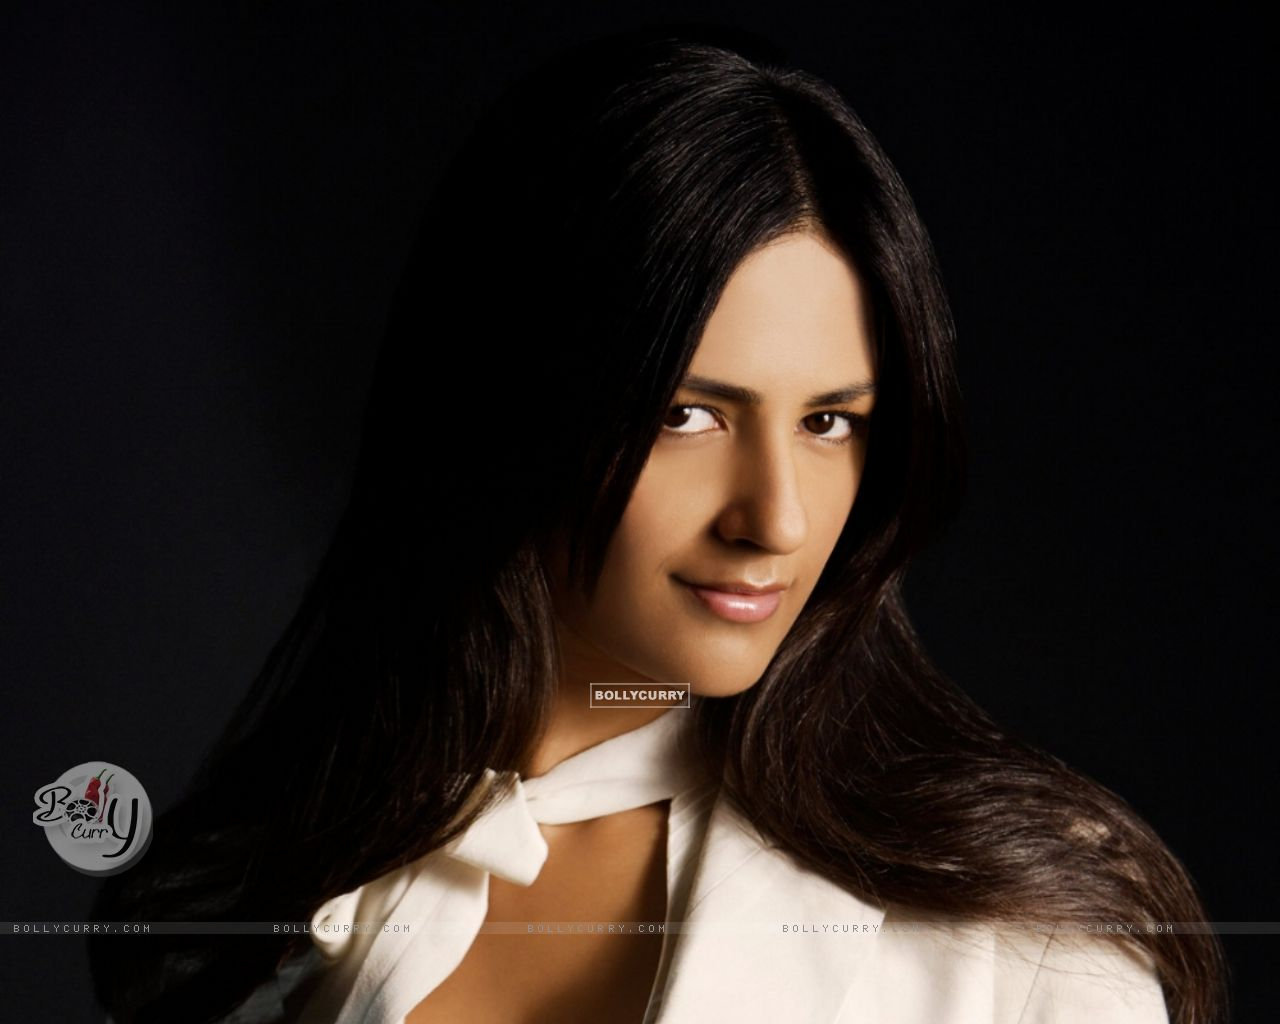 Aruna Shields - Photo Gallery